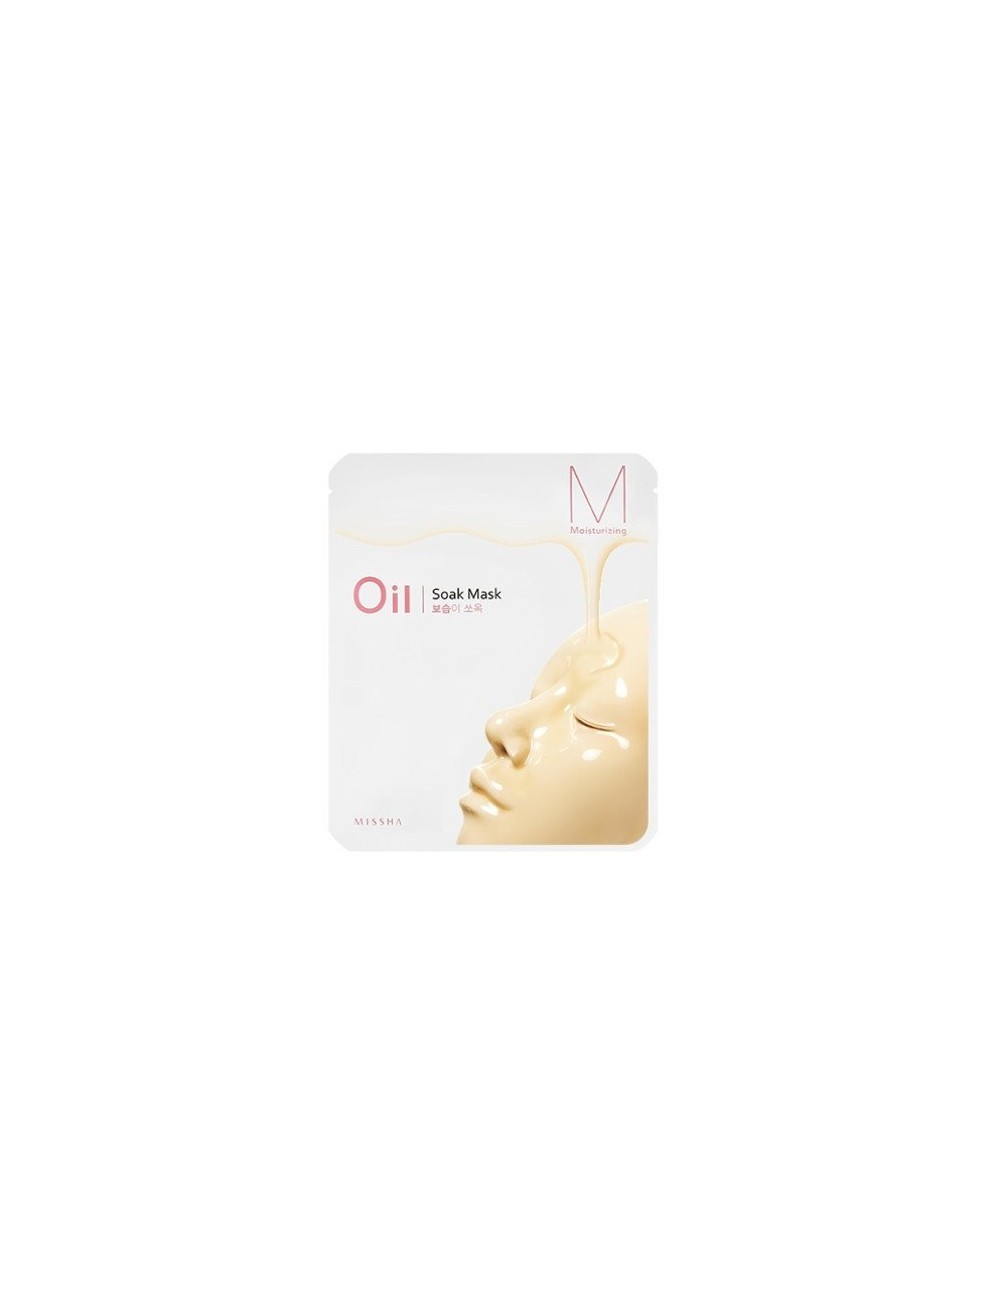 Mascarilla Hidratante e Iluminadora Oil Soak Mask Moisturizing